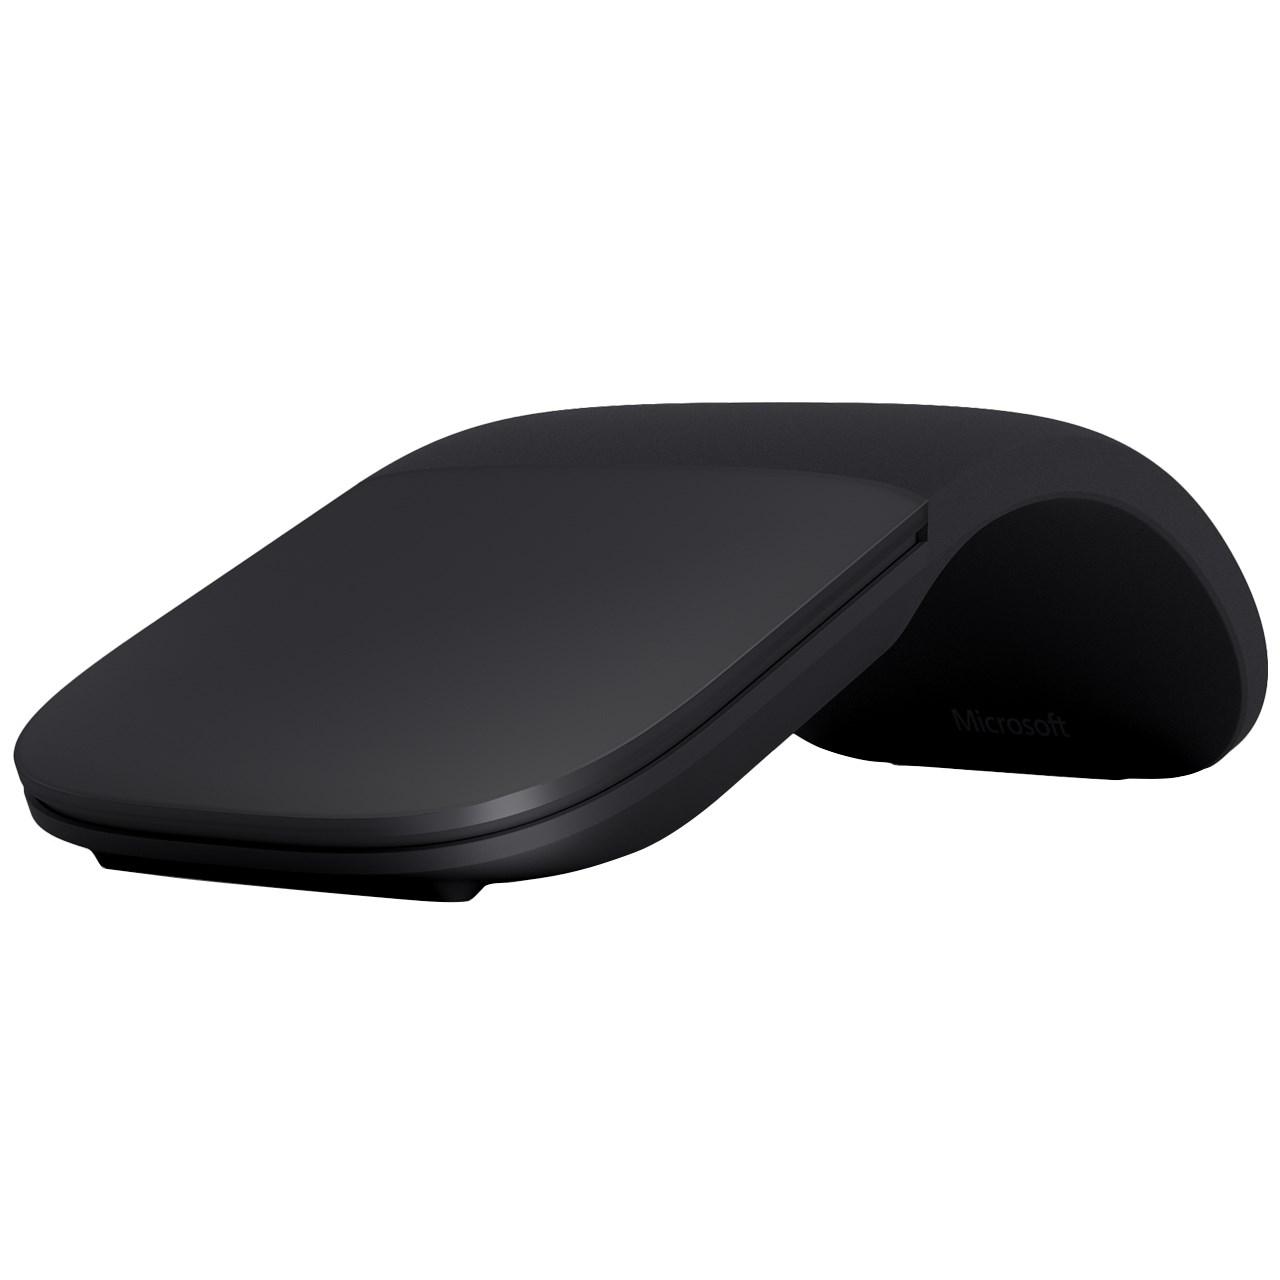 ماوس مایکروسافت مدل ۲۰۱۷ Surface Arc